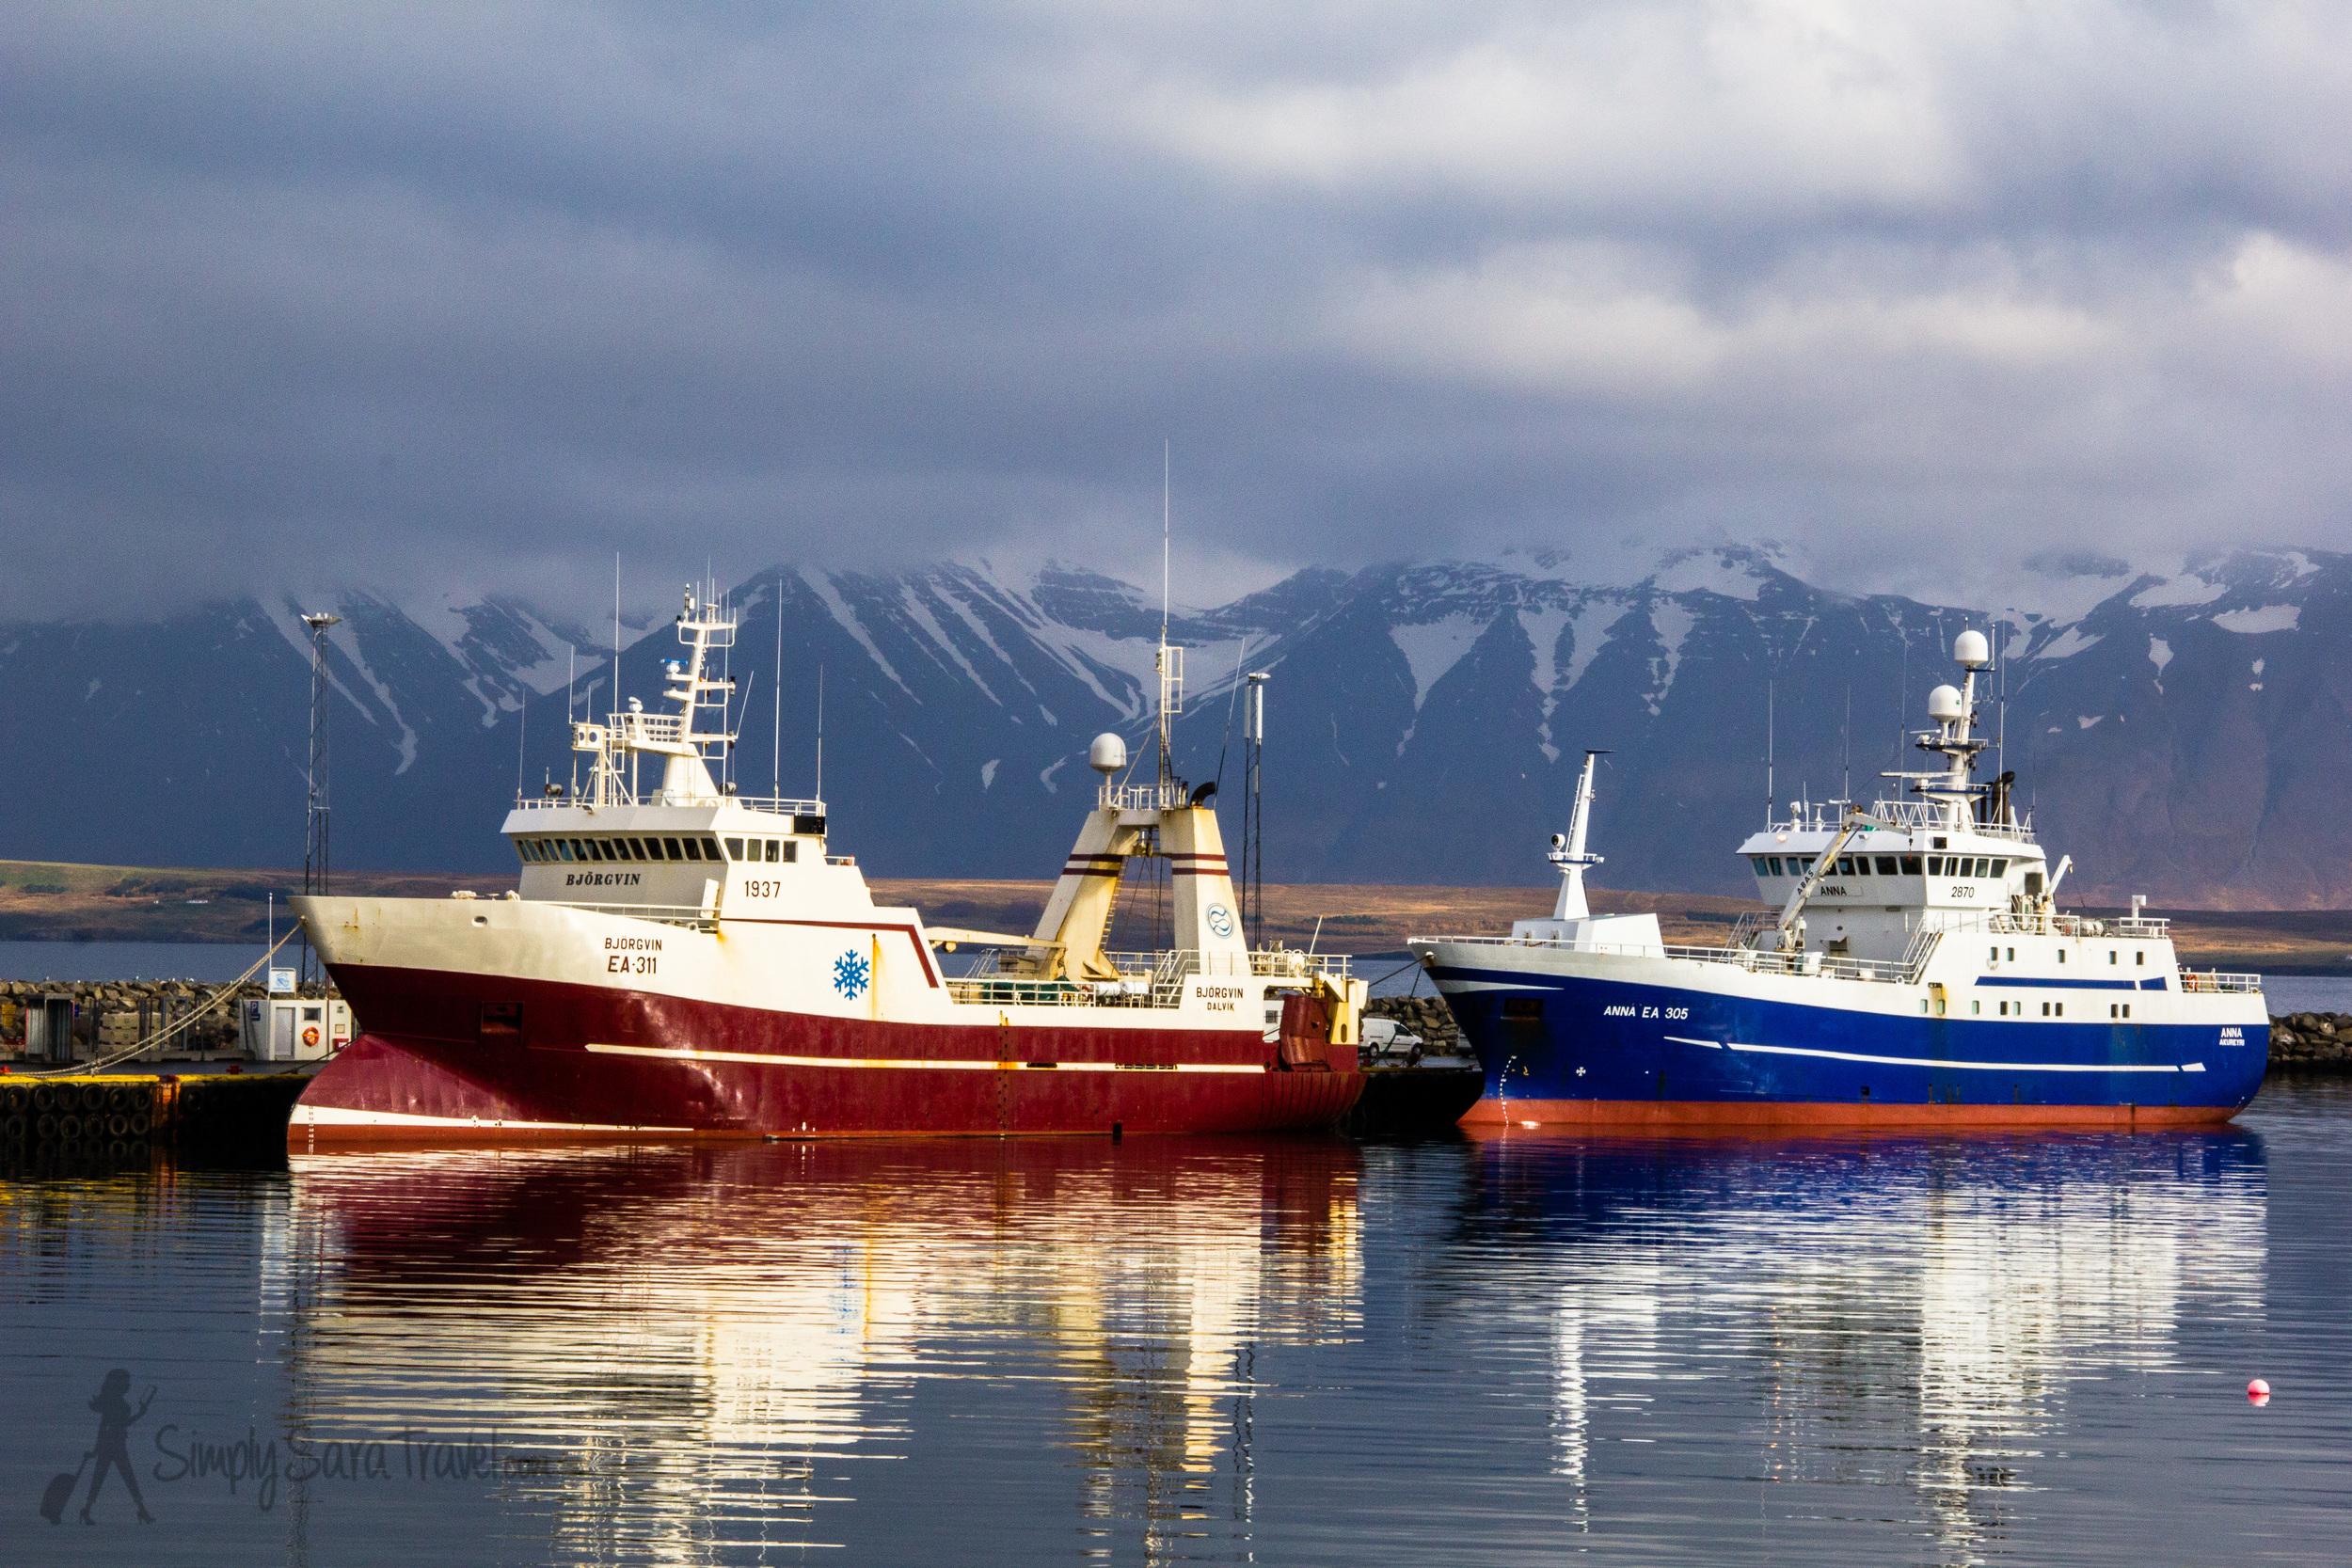 Boats in Dalvik, Iceland